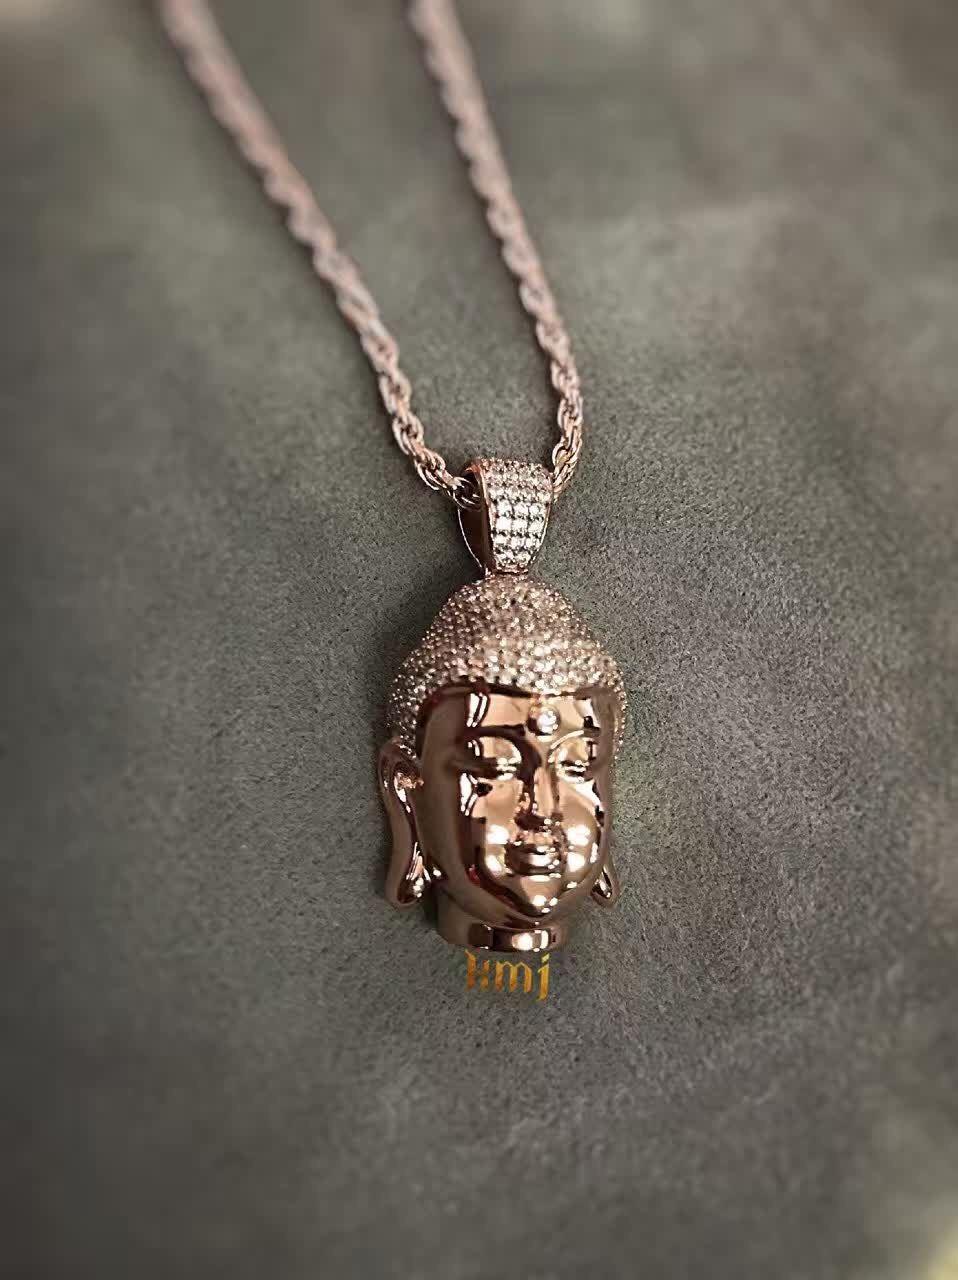 Buddha Head In Rose Gold Custom Made Bijouteriegonin Com Bijouteriegonin Jesuspiece Microjesus Babyjesus Nanojesus Redjesus Kanyewest Thegame